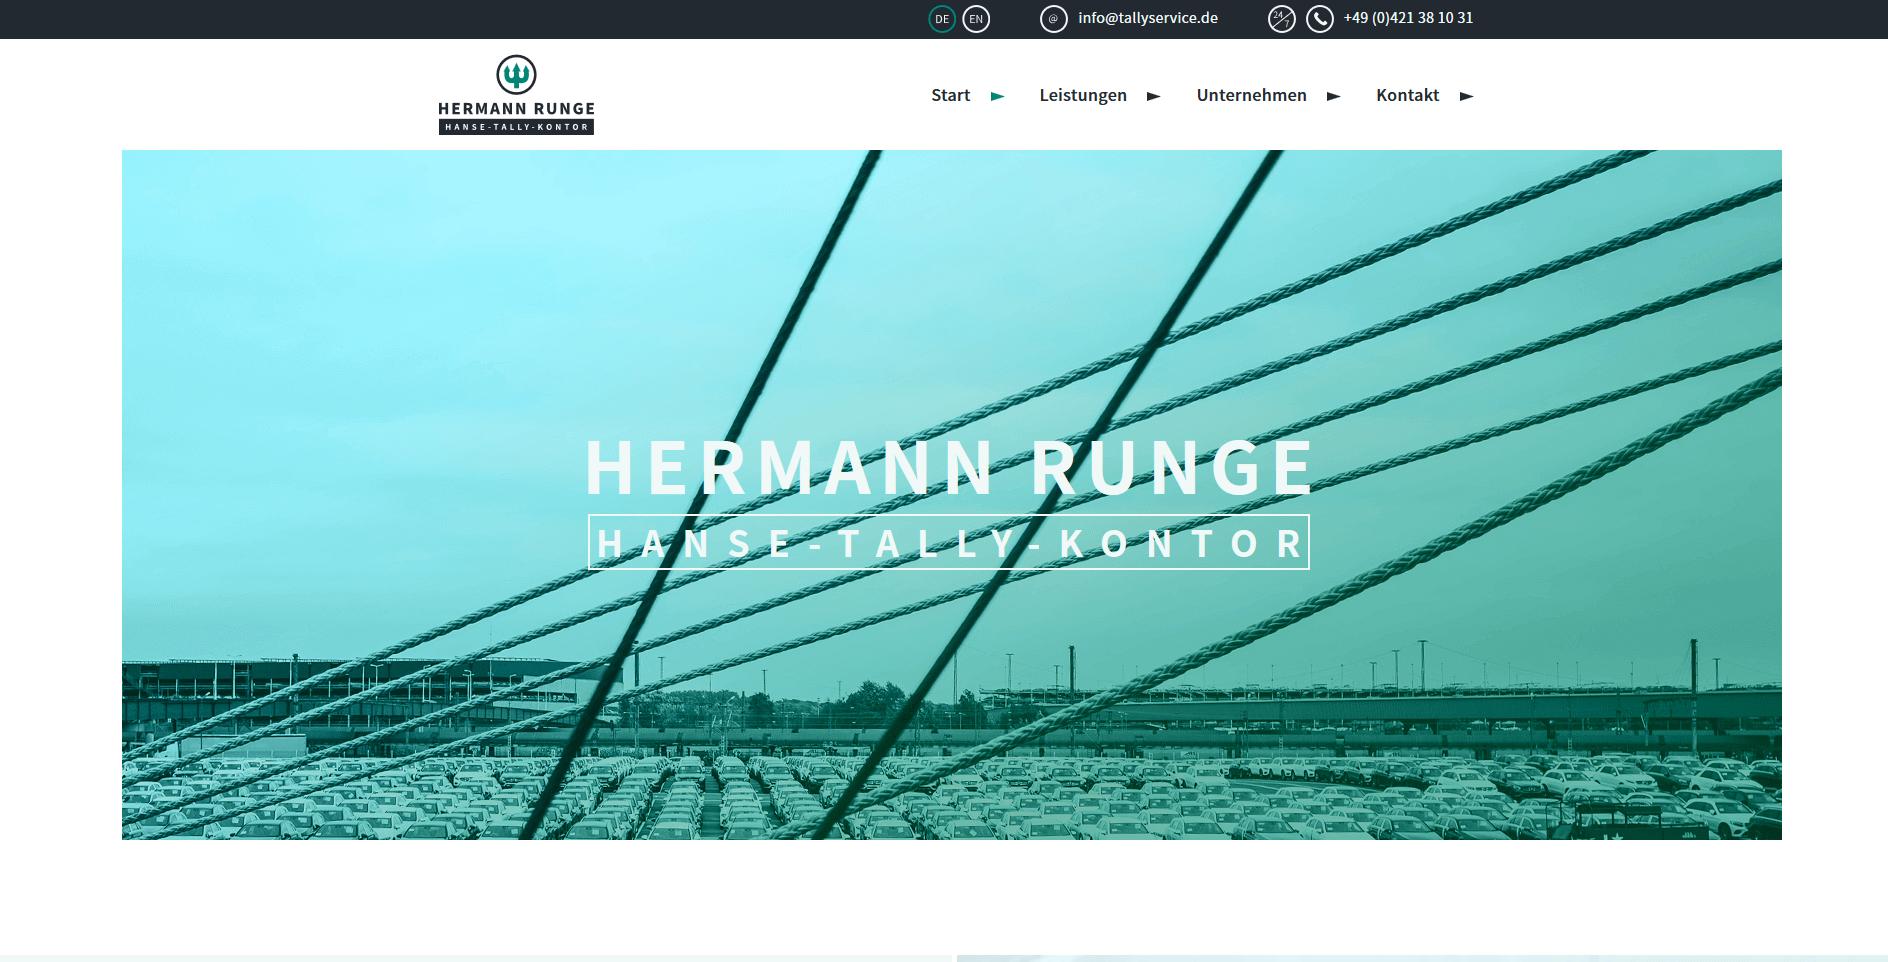 Hermann Runge Hanse-Tally-Kontor